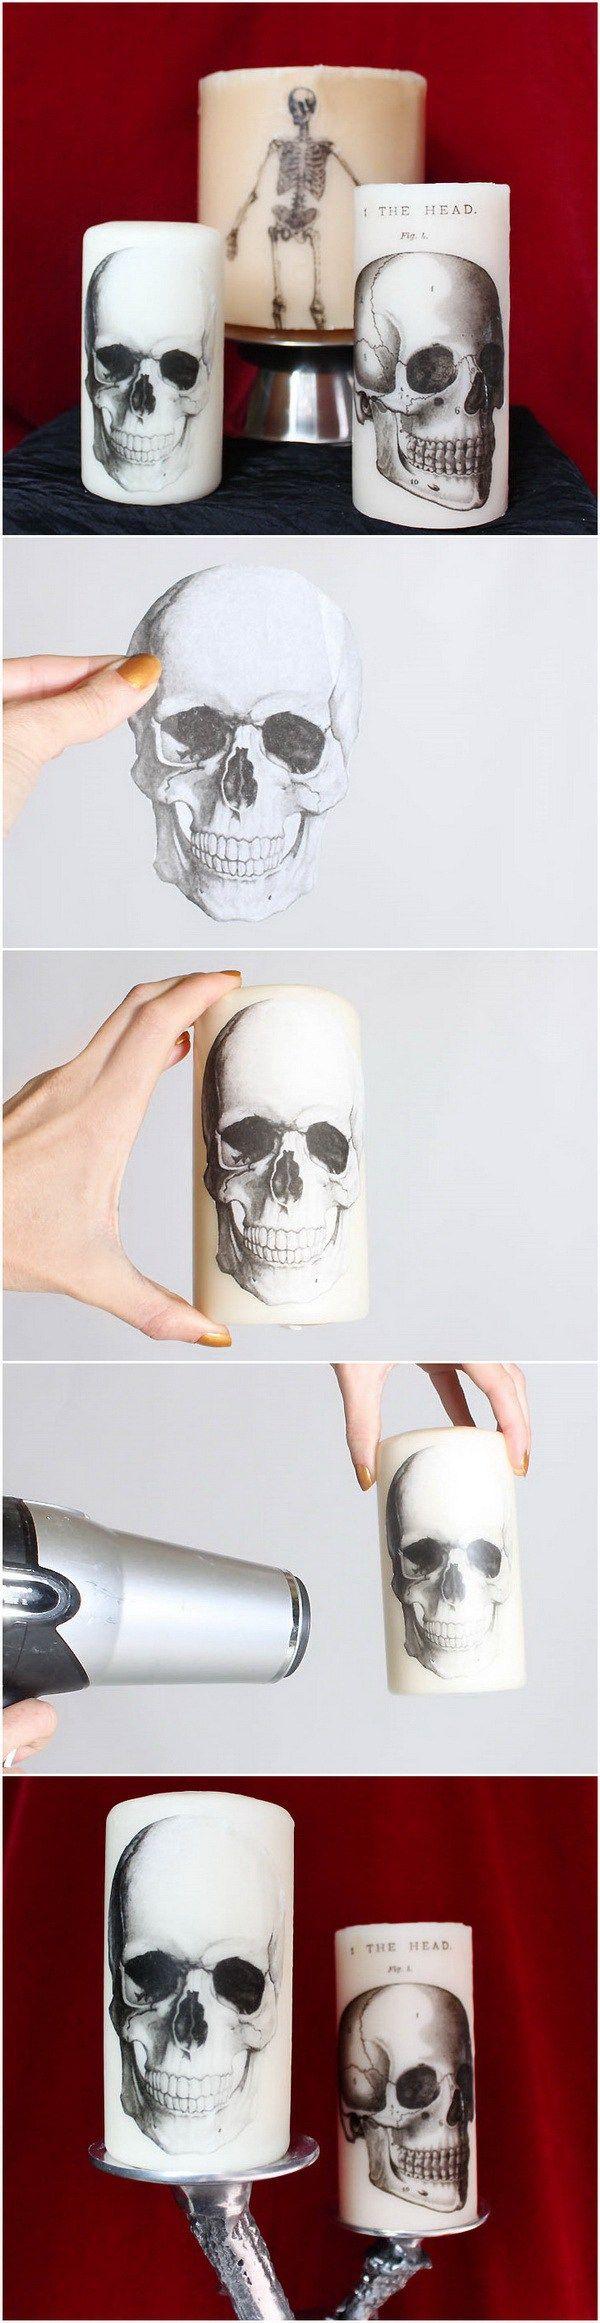 20 creative diy halloween decor ideas - Diy Indoor Halloween Decorations